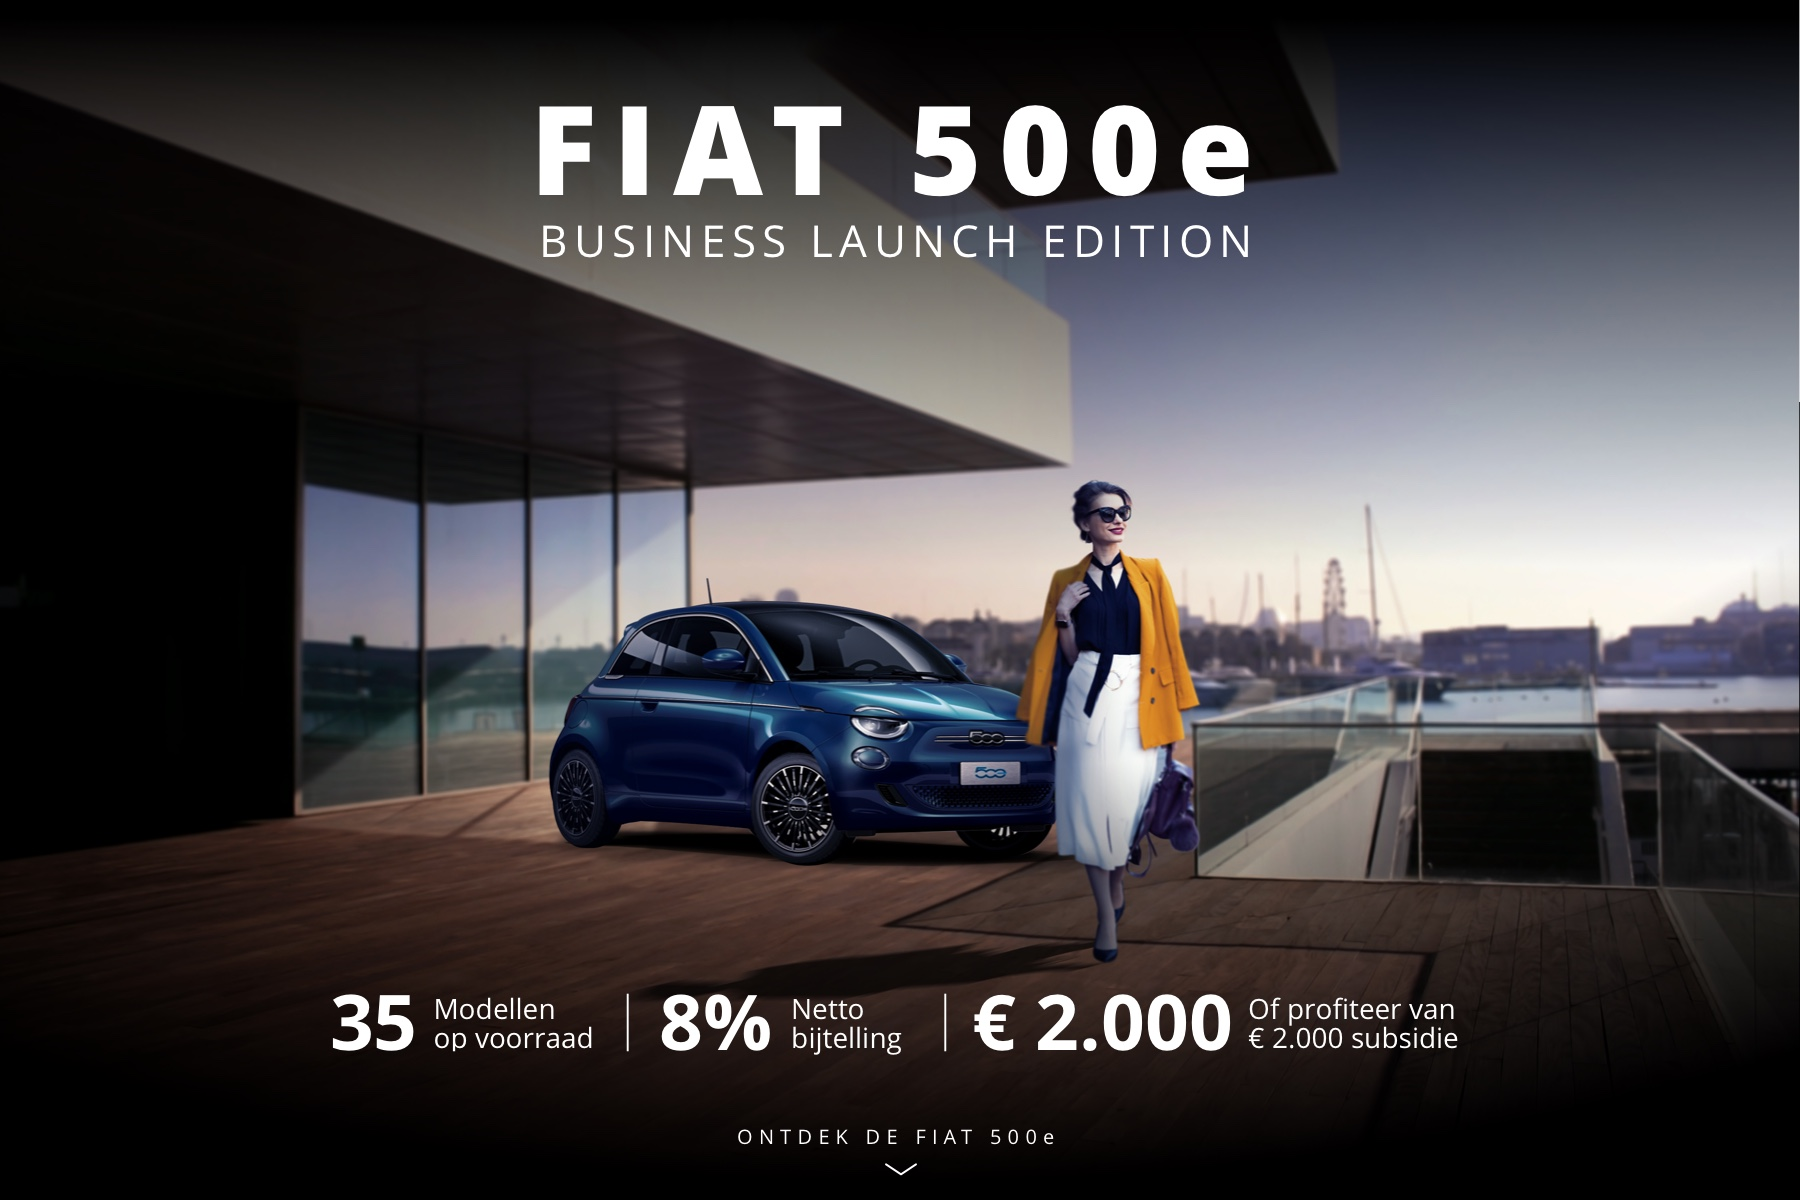 ONTDEK DE FIAT 500e